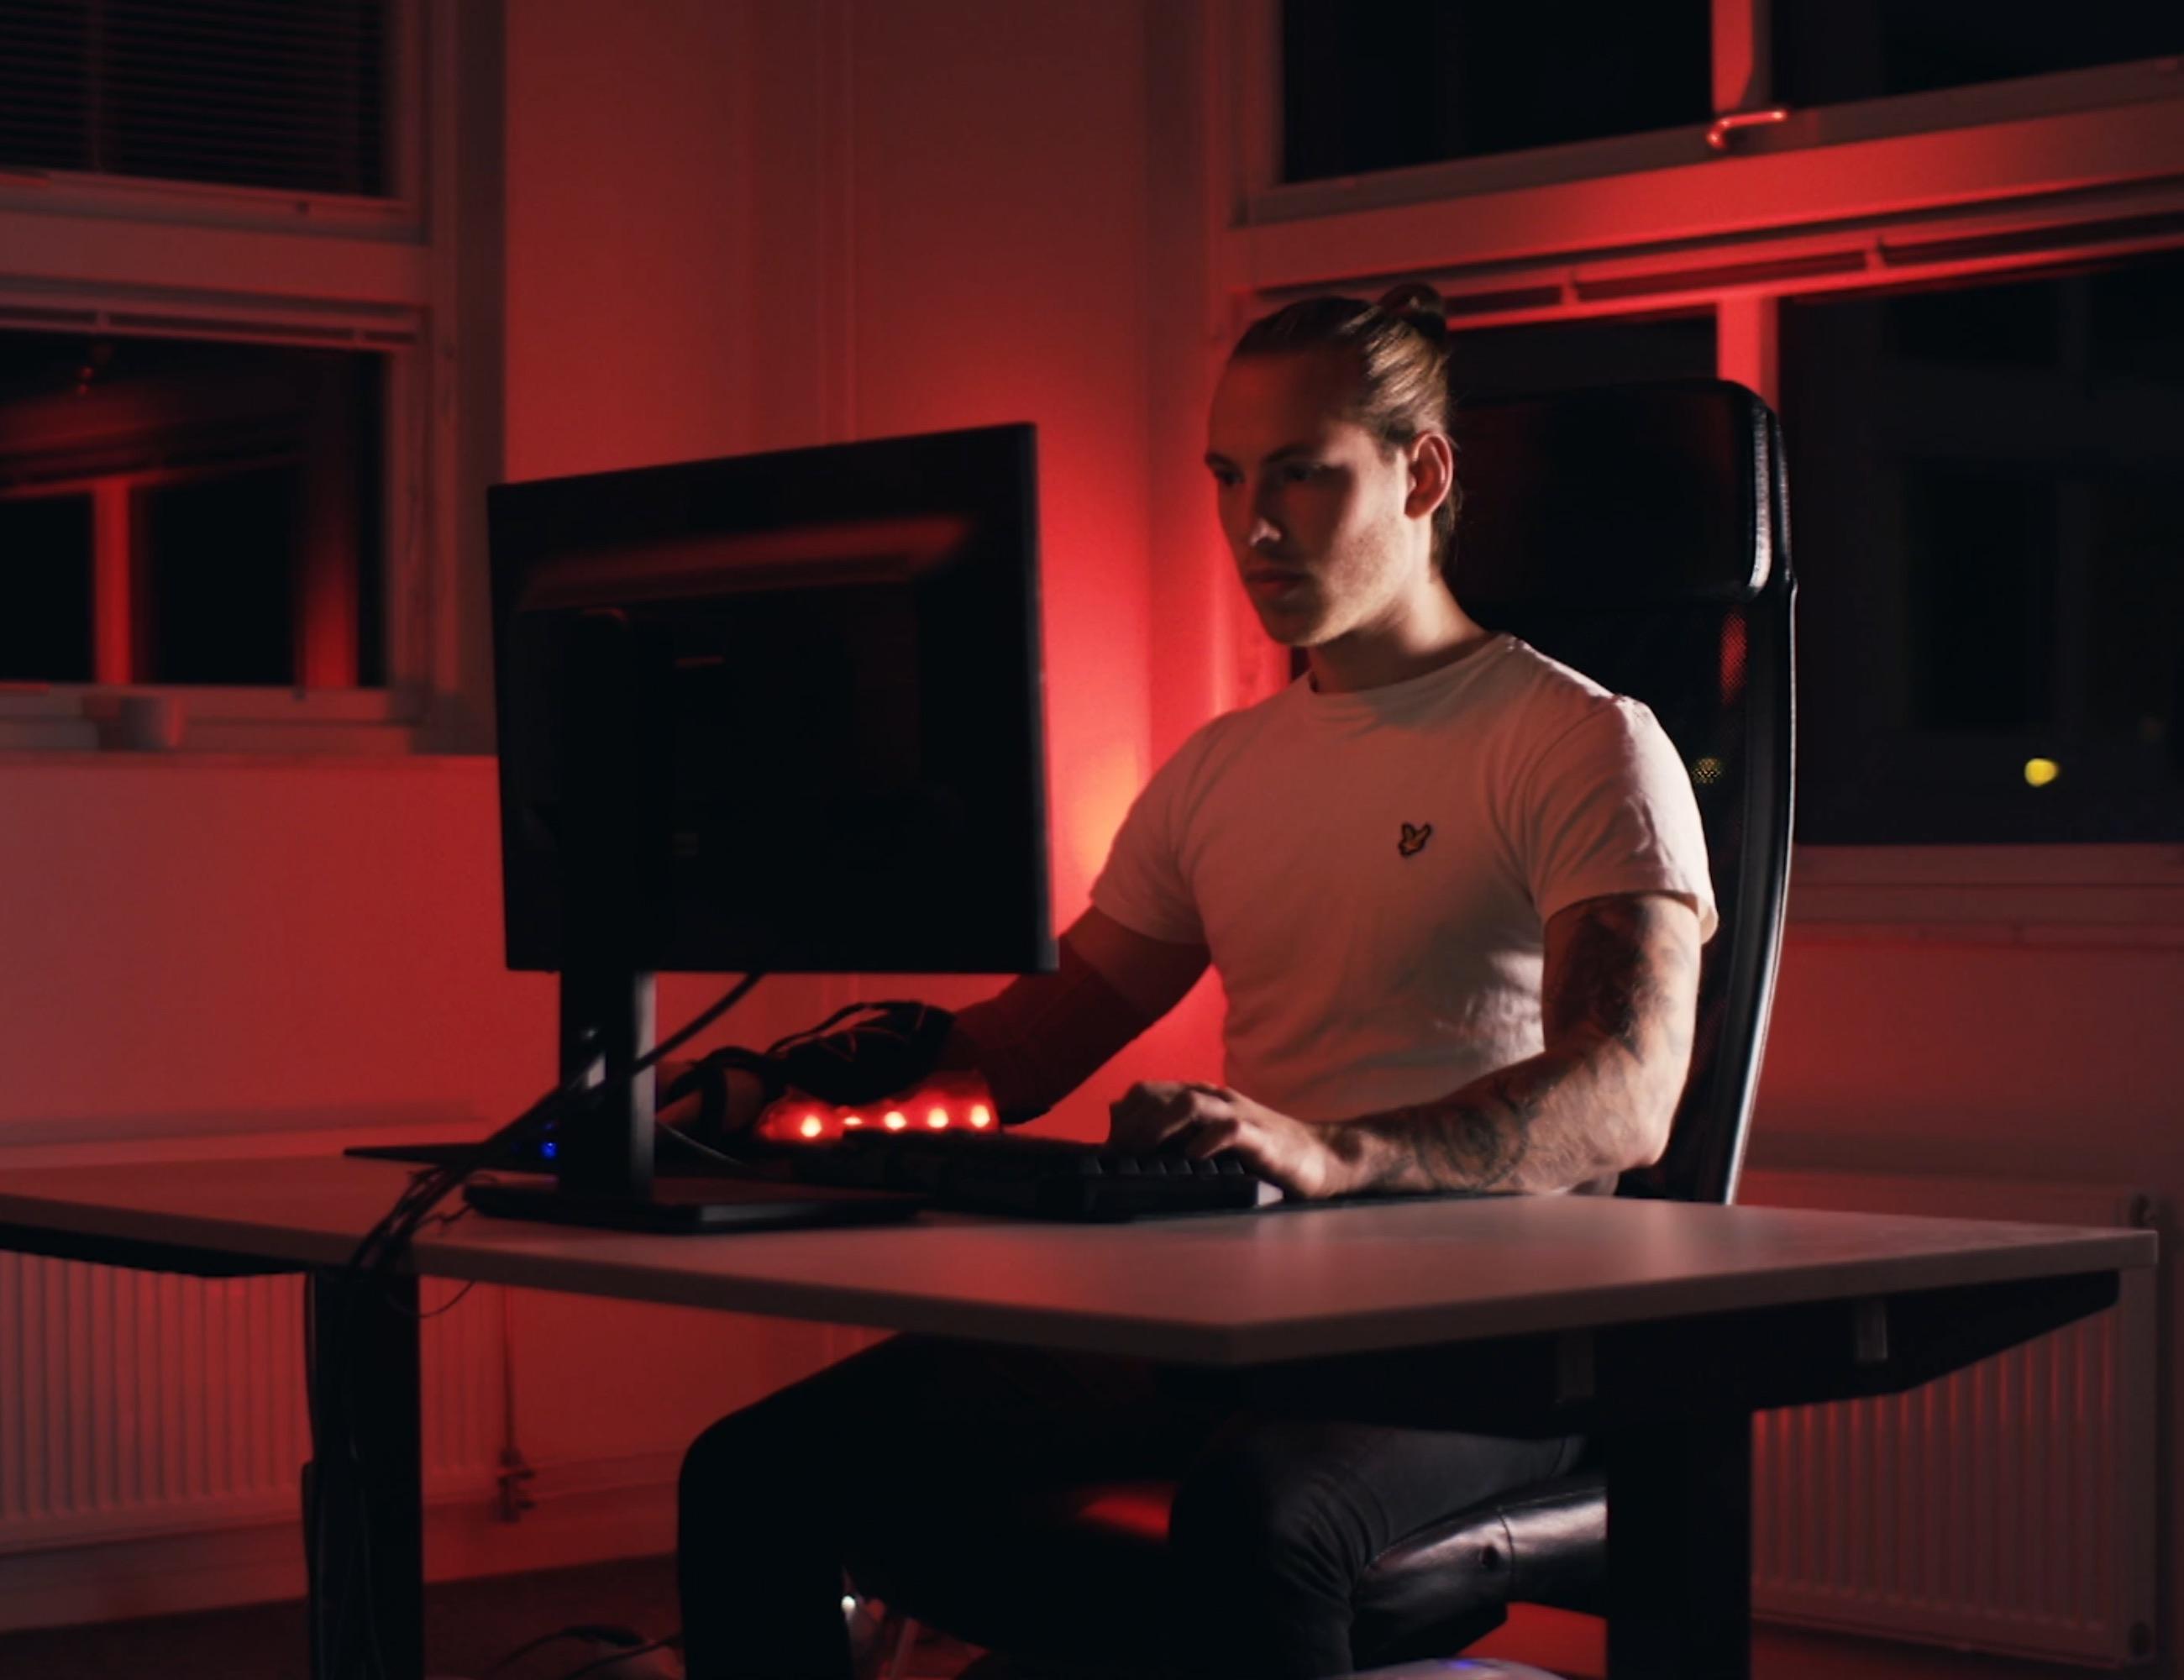 Flashe Performance Enhancing Gaming Glove